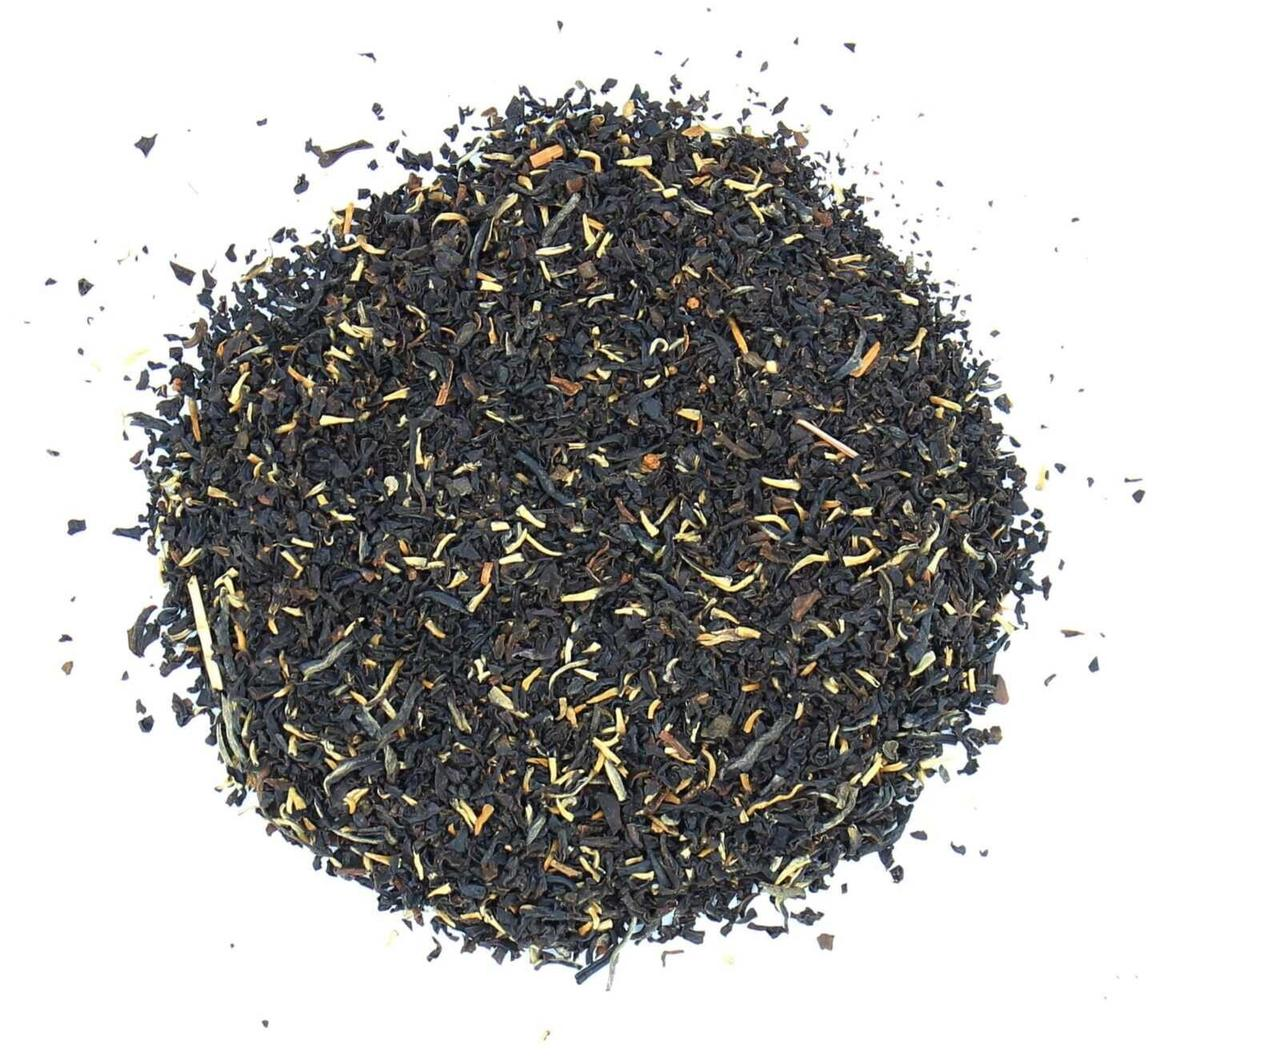 Чай Teahouse (Тіахаус) Золоті тіпси Цейлону 250 г (Tea Teahouse Ceylon Gold Tips 250 g)